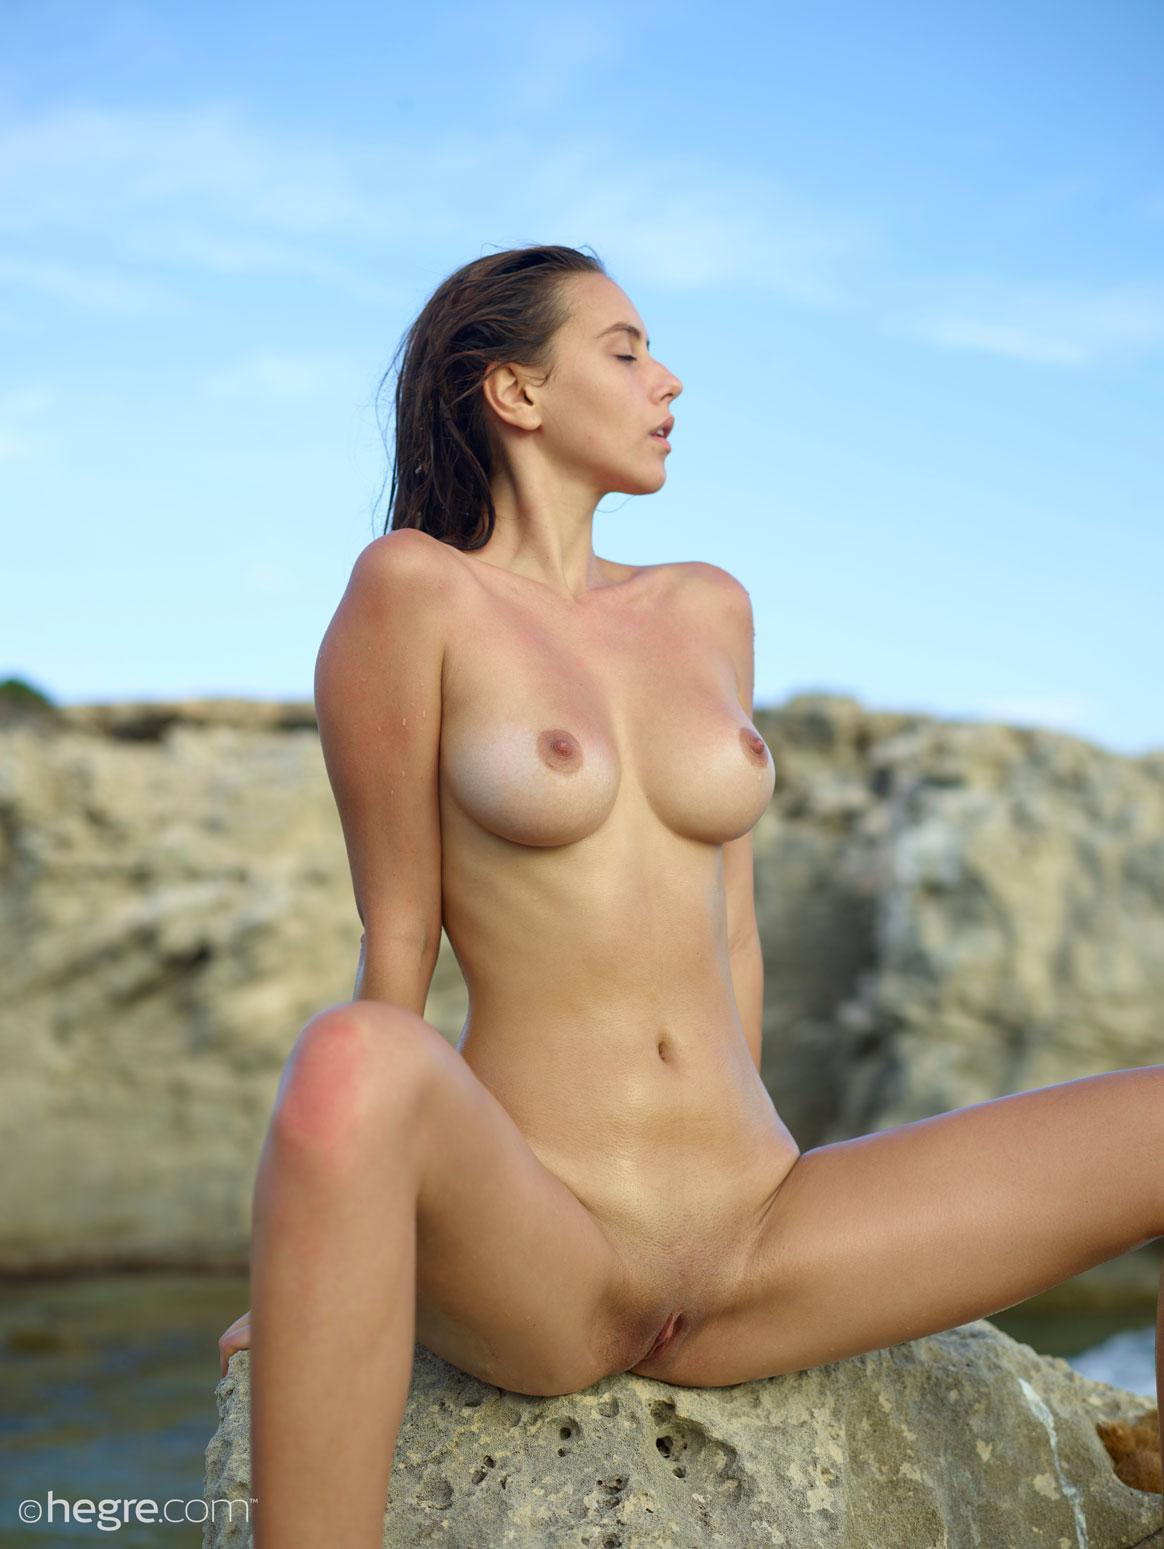 Small white girls nude self shot